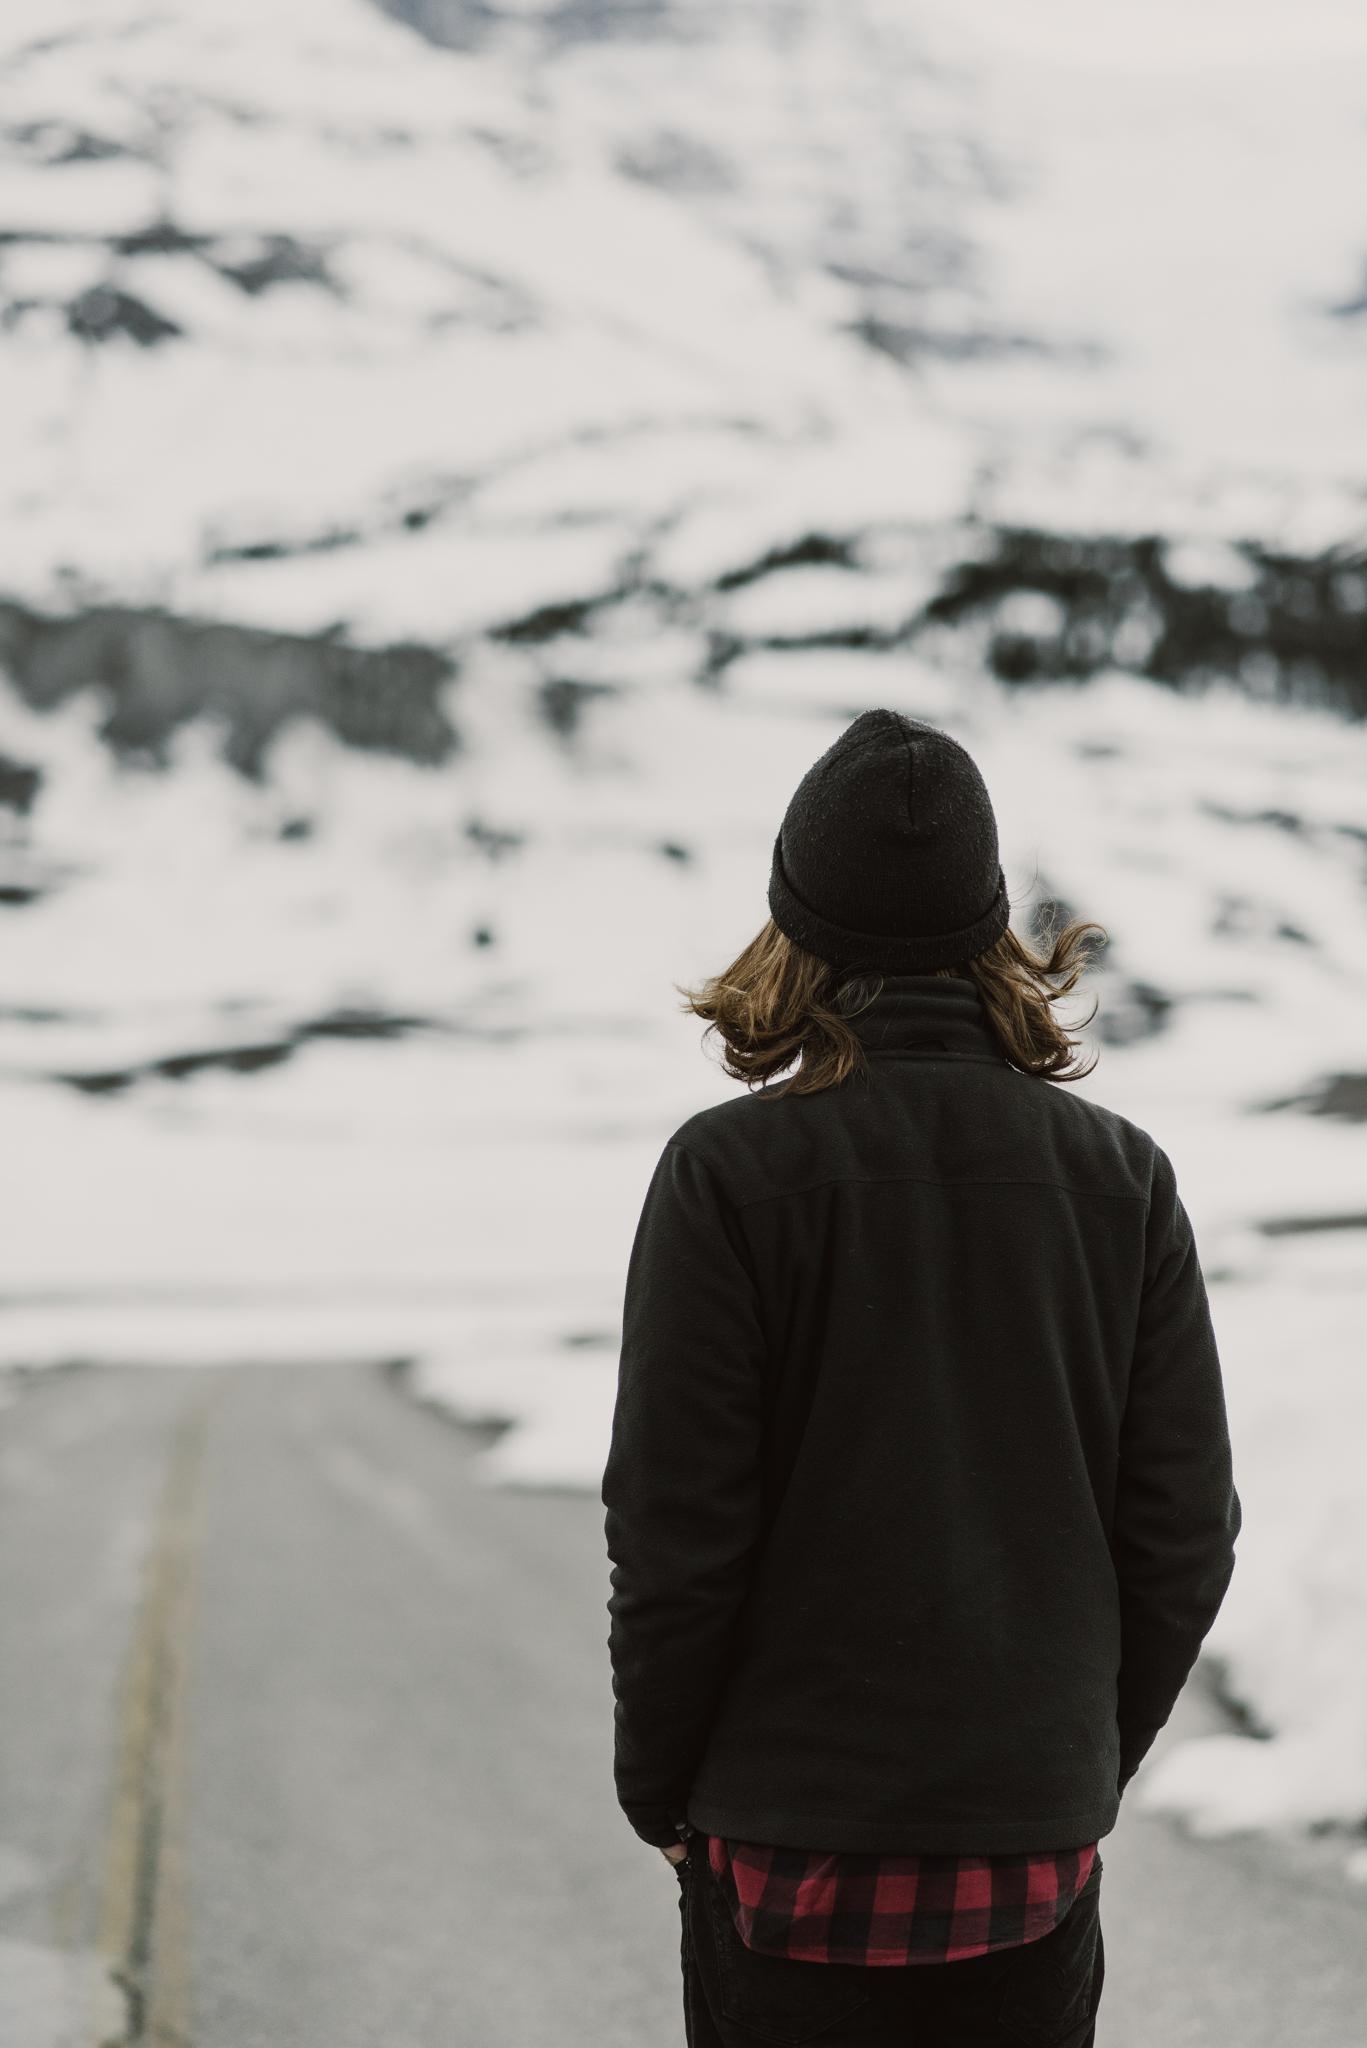 ©The-Ryans-Photo---Athabasca-Glacier,-Ice-Cave-013.jpg